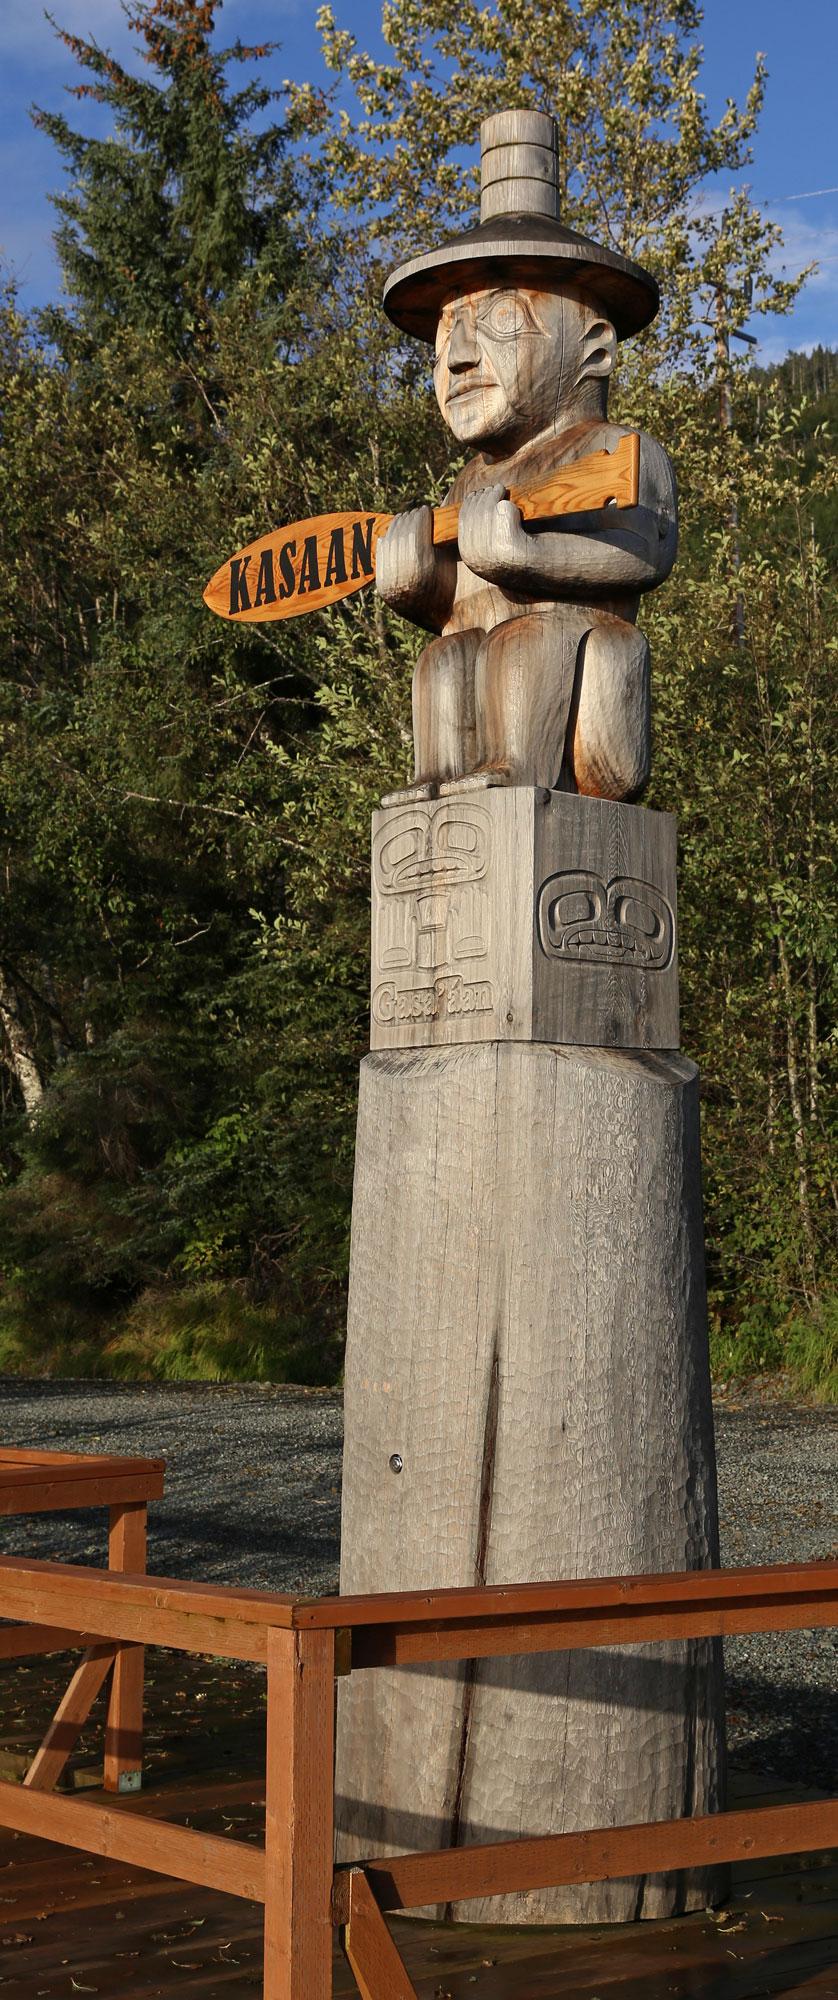 Kasaan Alaska harbor totem